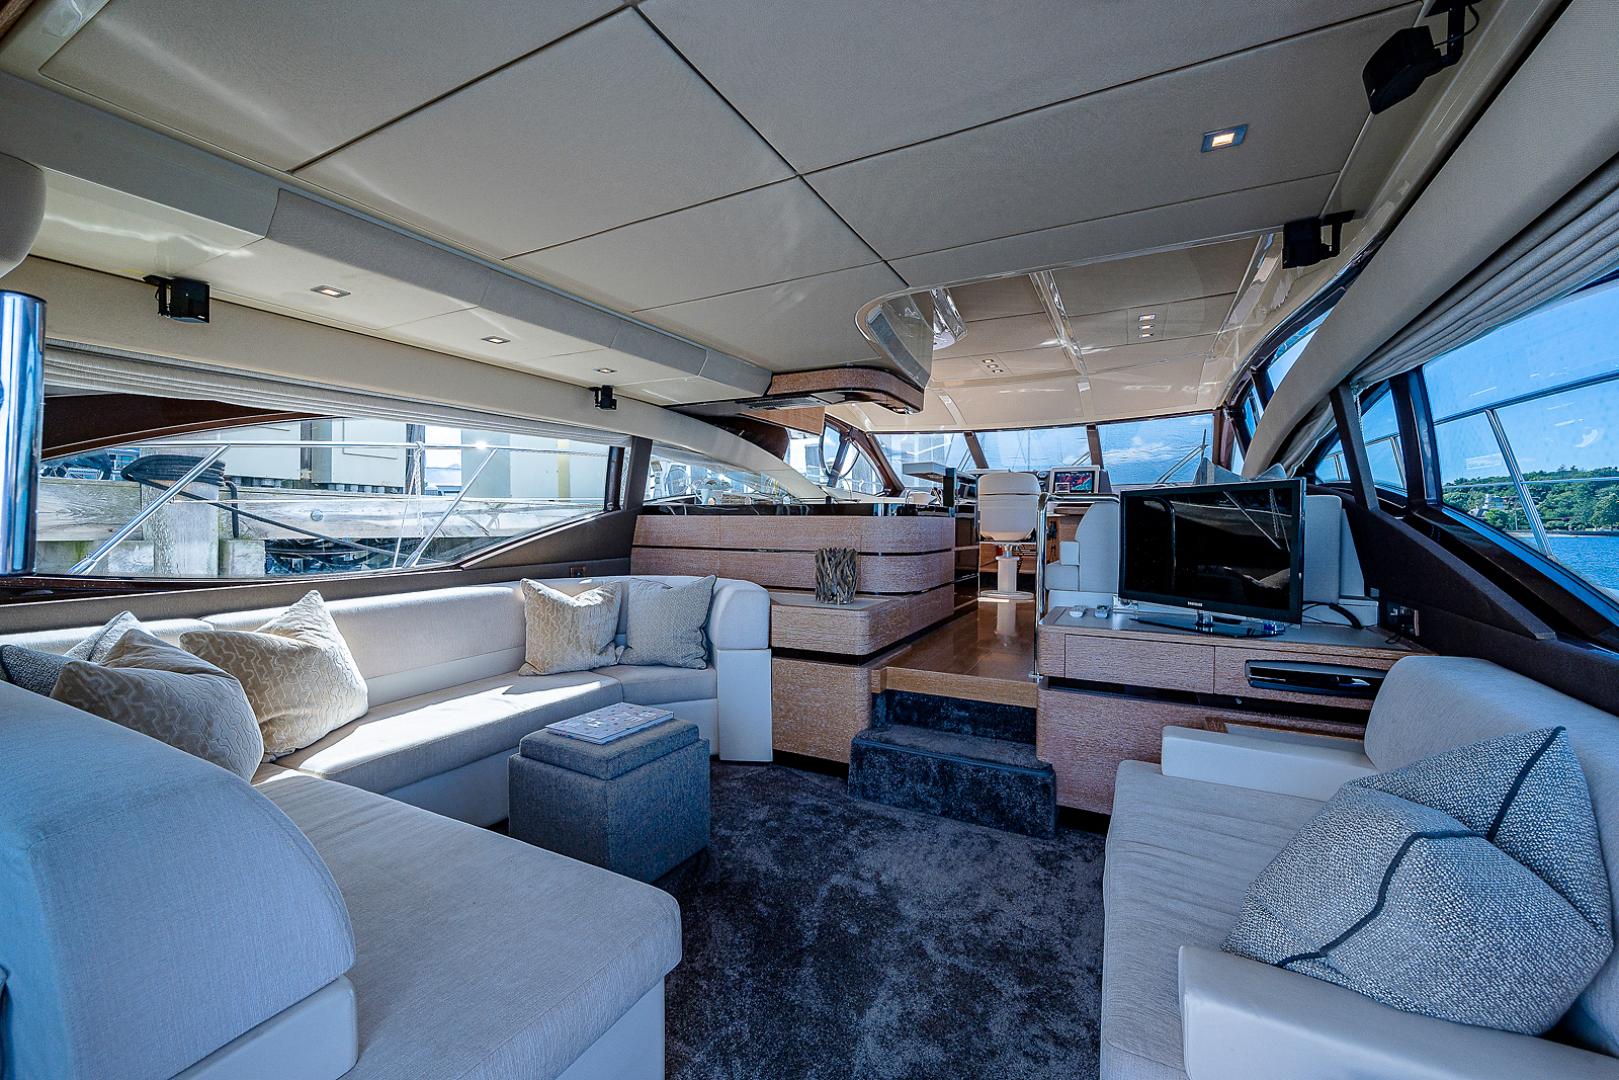 Azimut-58 Fly Motor Yacht 2011-Nova Fort Lauderdale-Florida-United States-58_azimut_nova__salon10-1490467 | Thumbnail